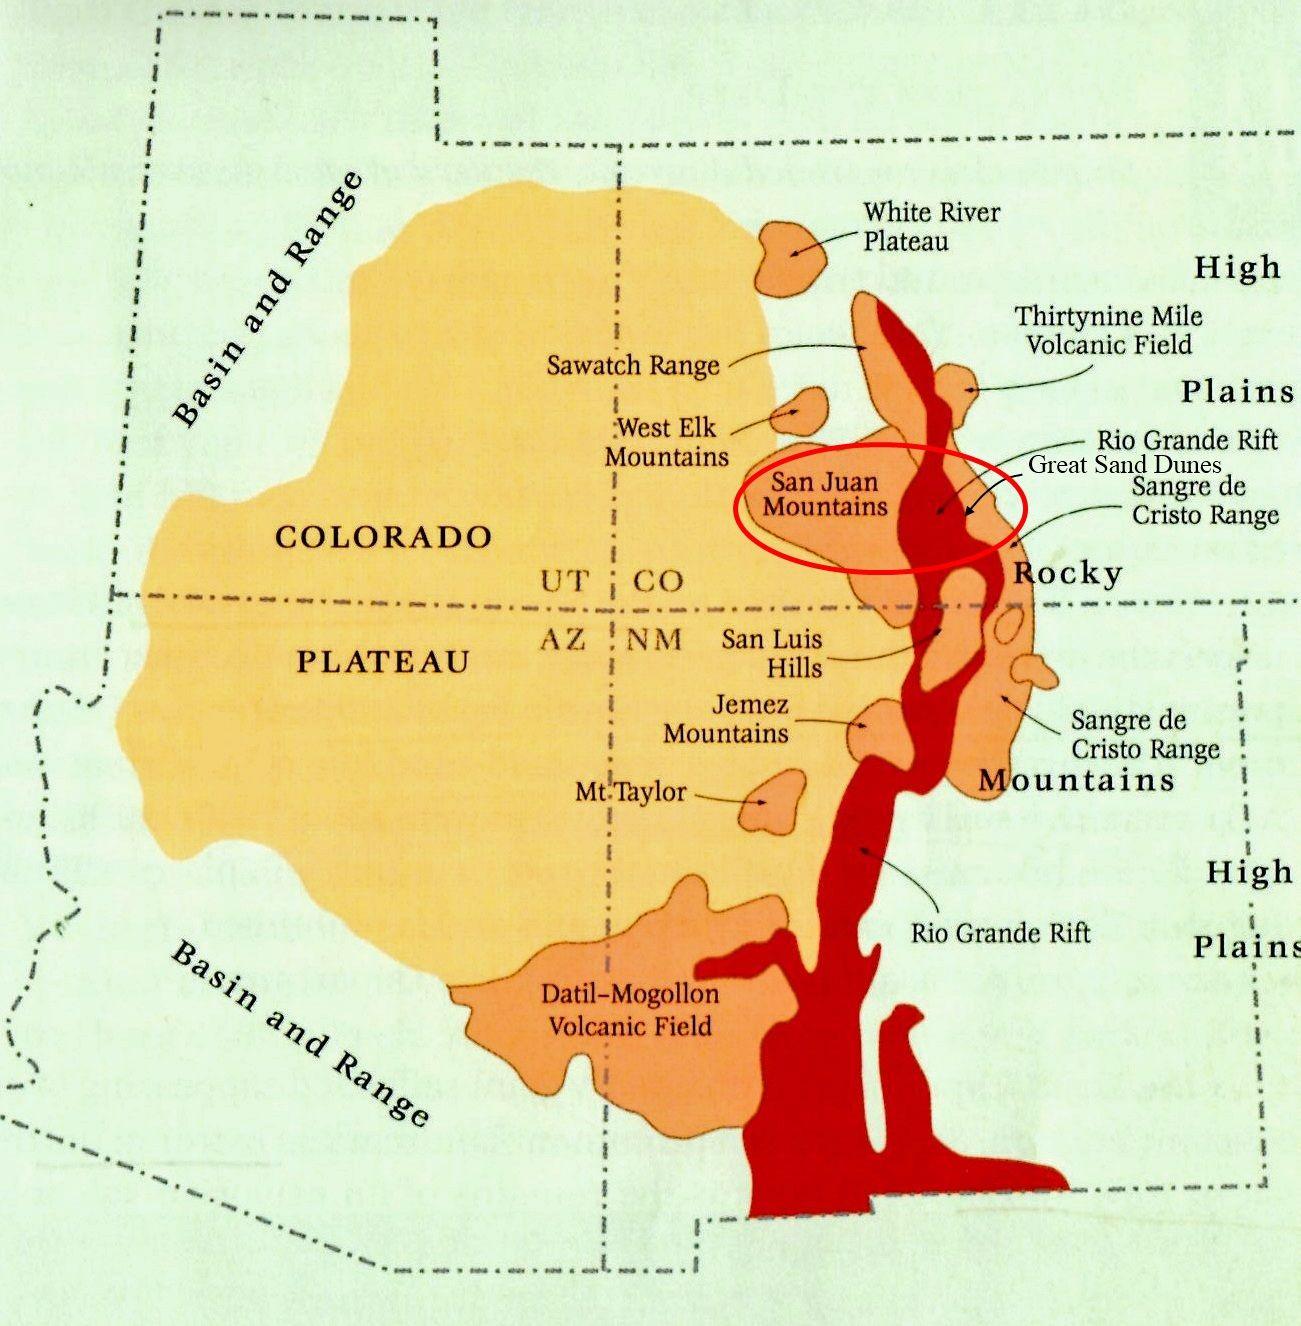 Rio Grande Rift Geology Pinterest Rio Grande And Geology - World map rio grande river